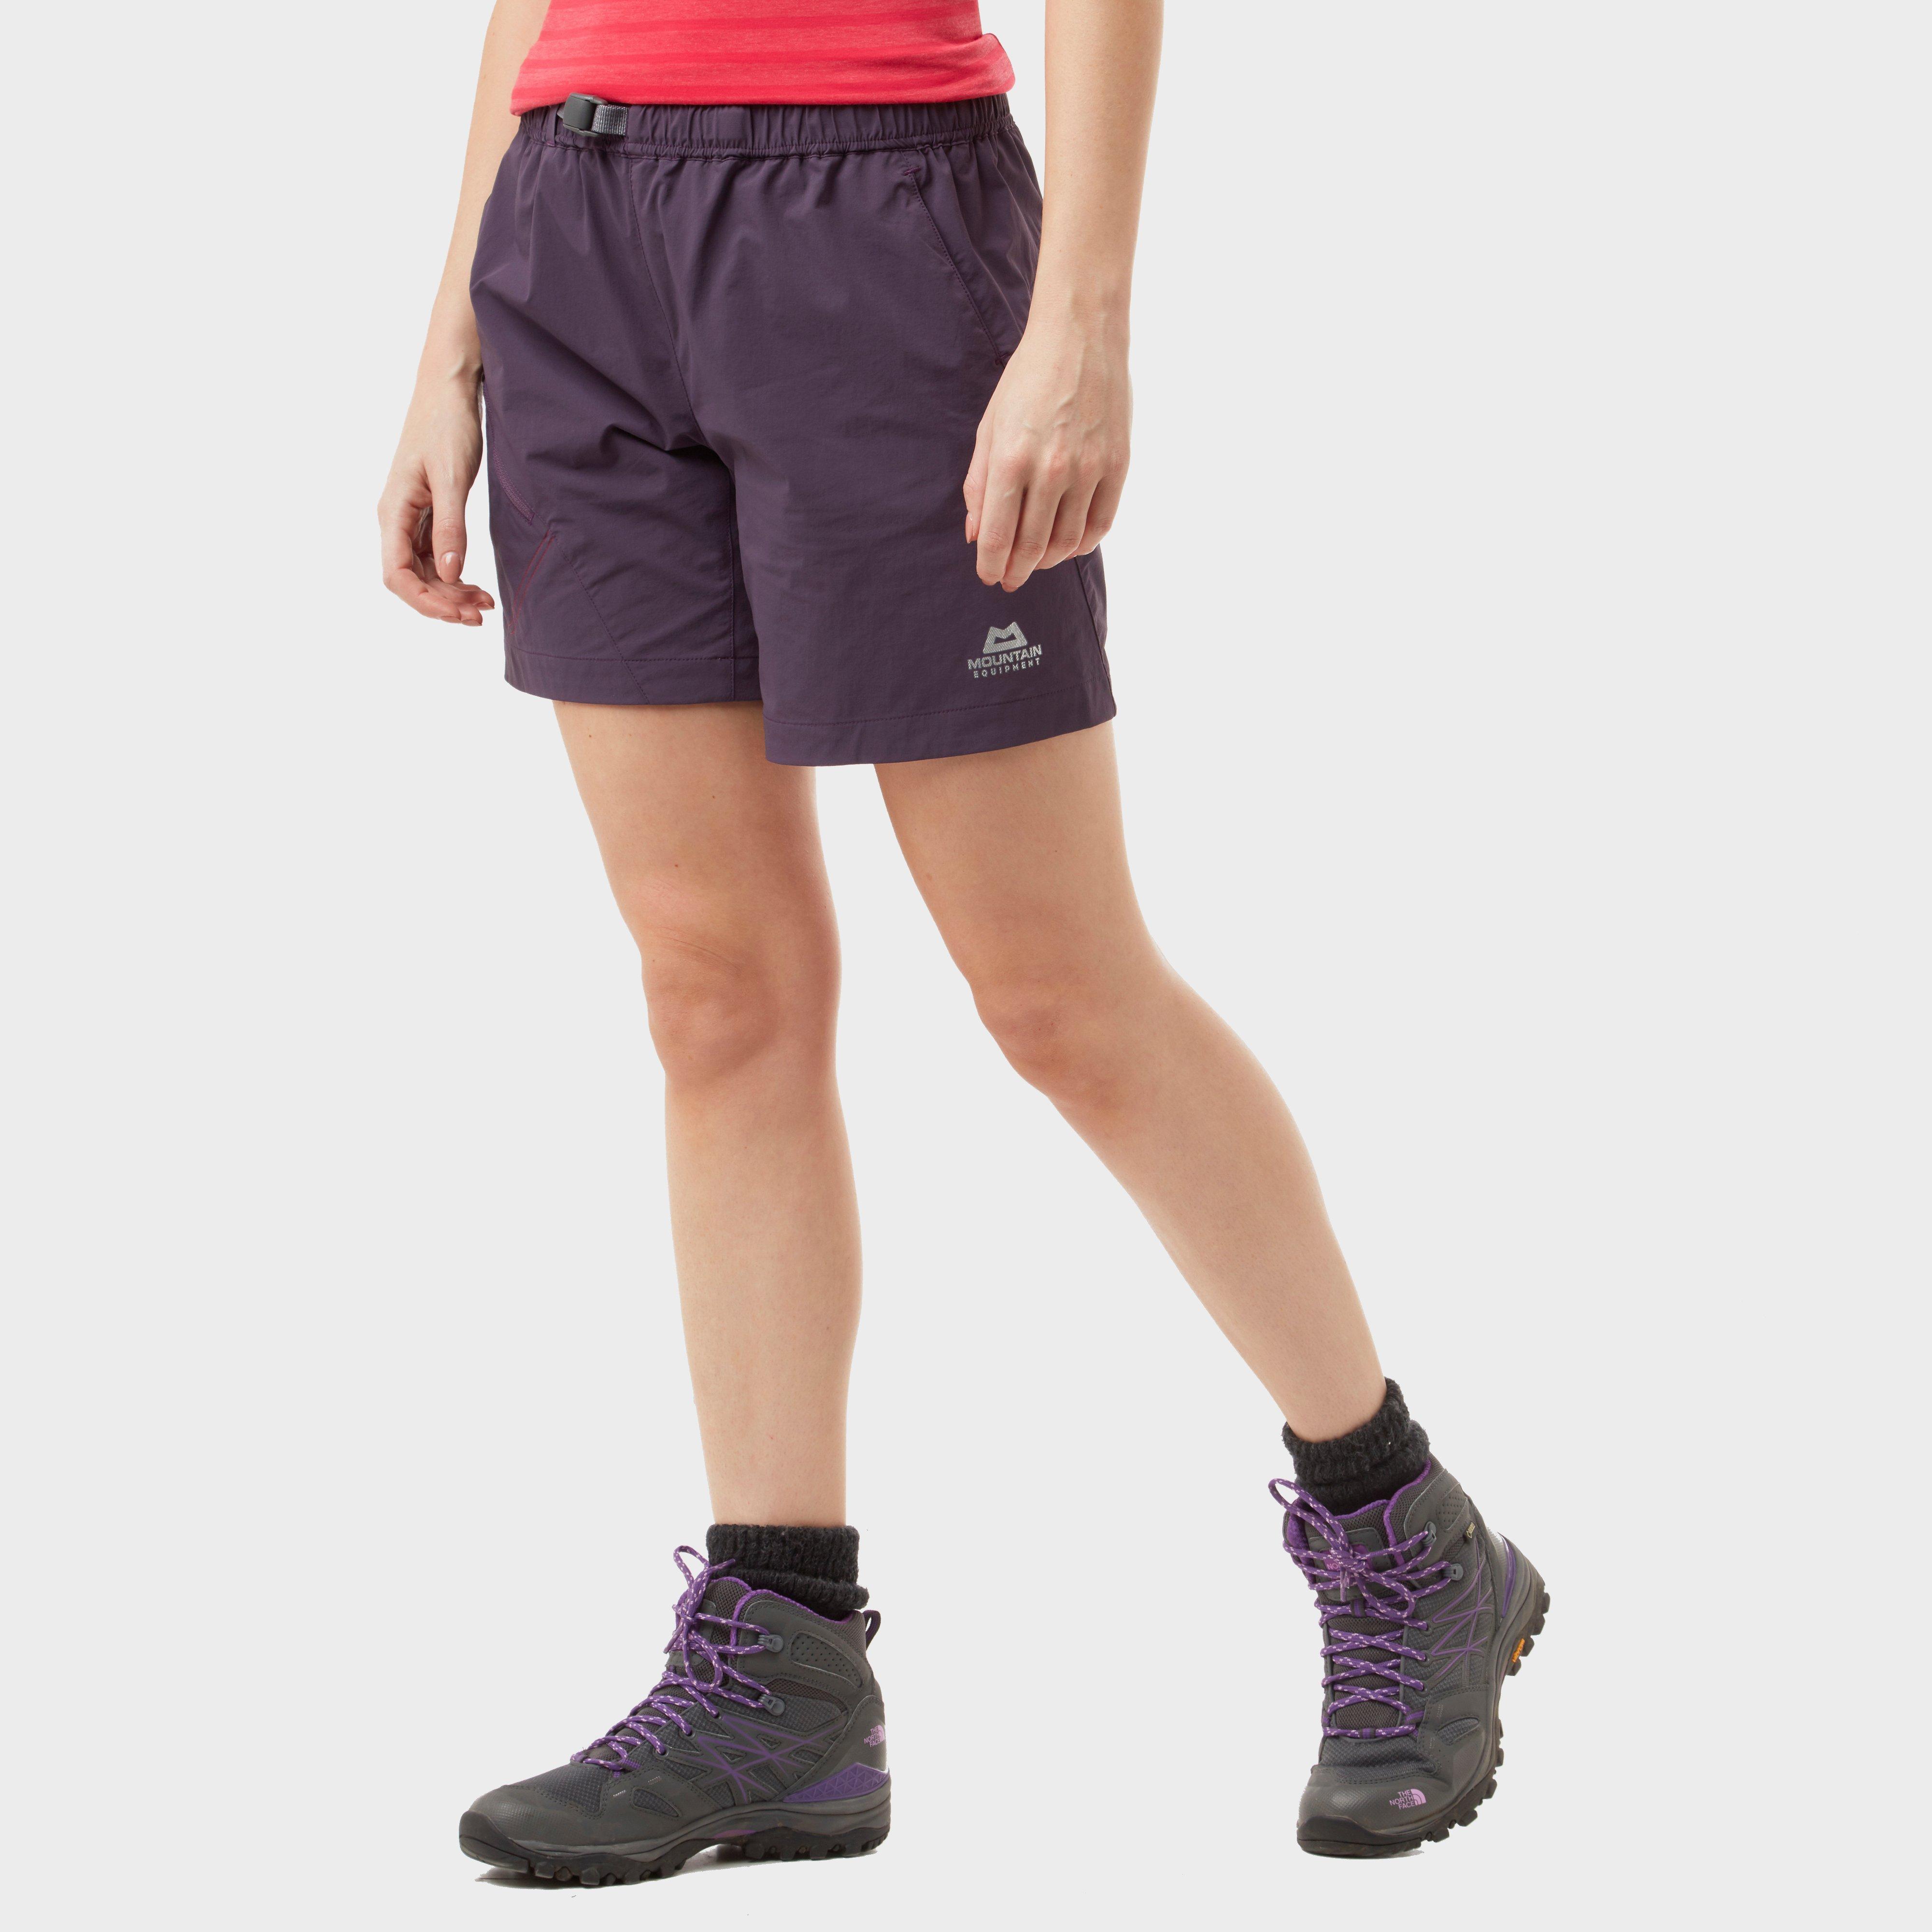 Mountain Equipment Mountain Equipment Womens Comici Trail Shorts - Purple, Purple